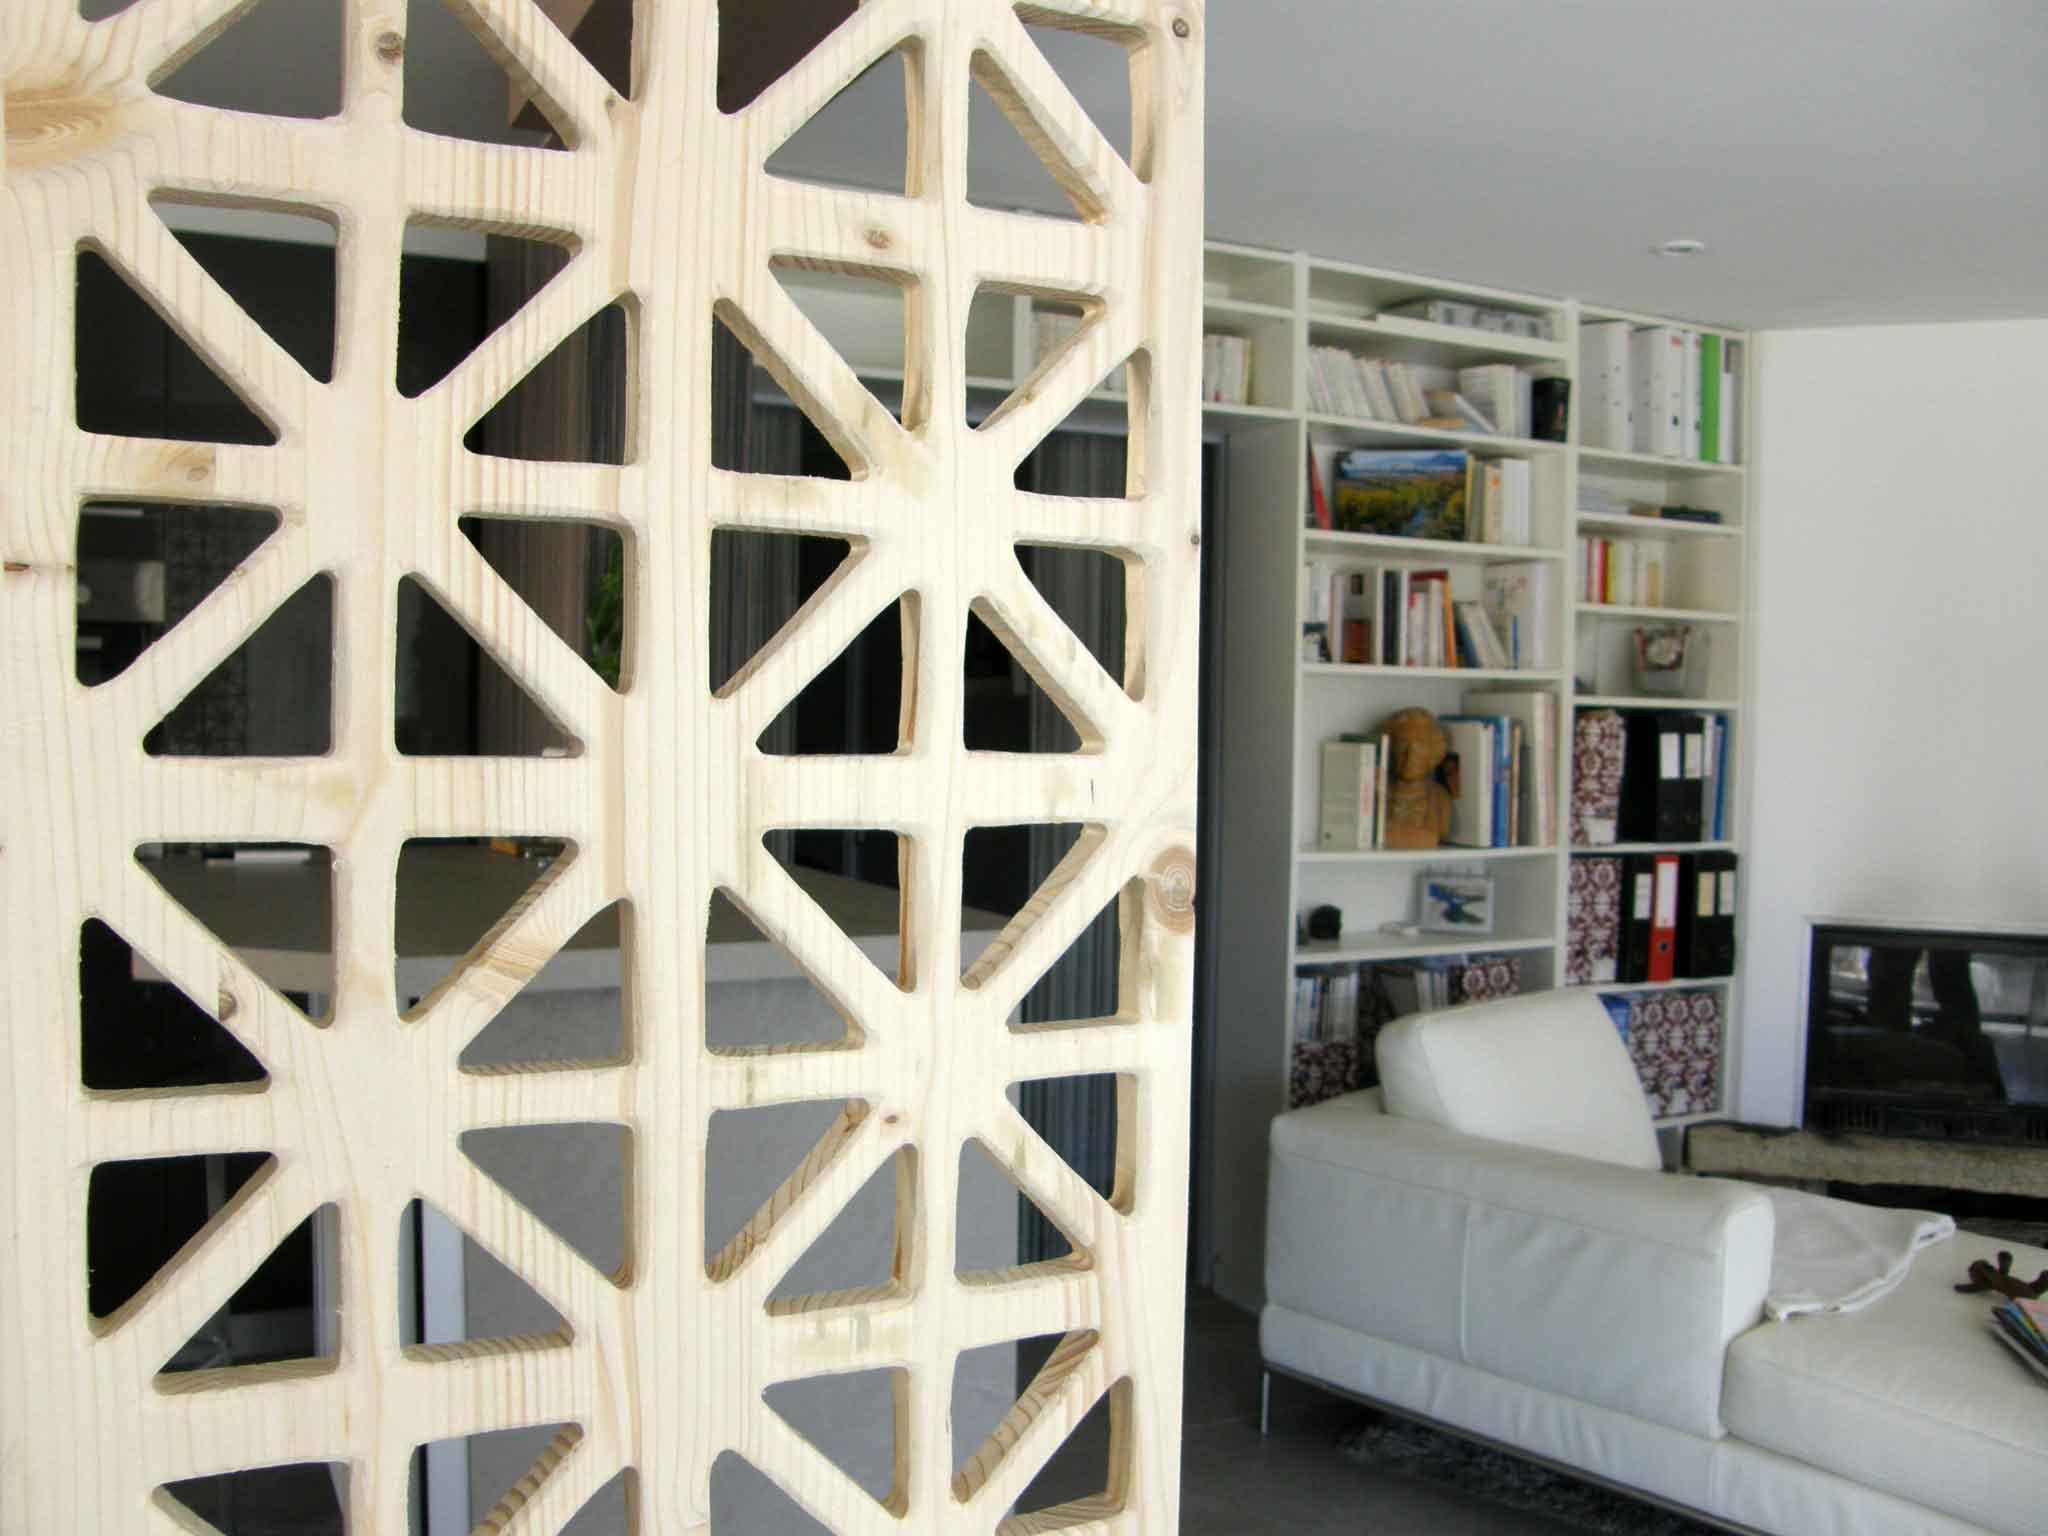 claustra bois naos. Black Bedroom Furniture Sets. Home Design Ideas